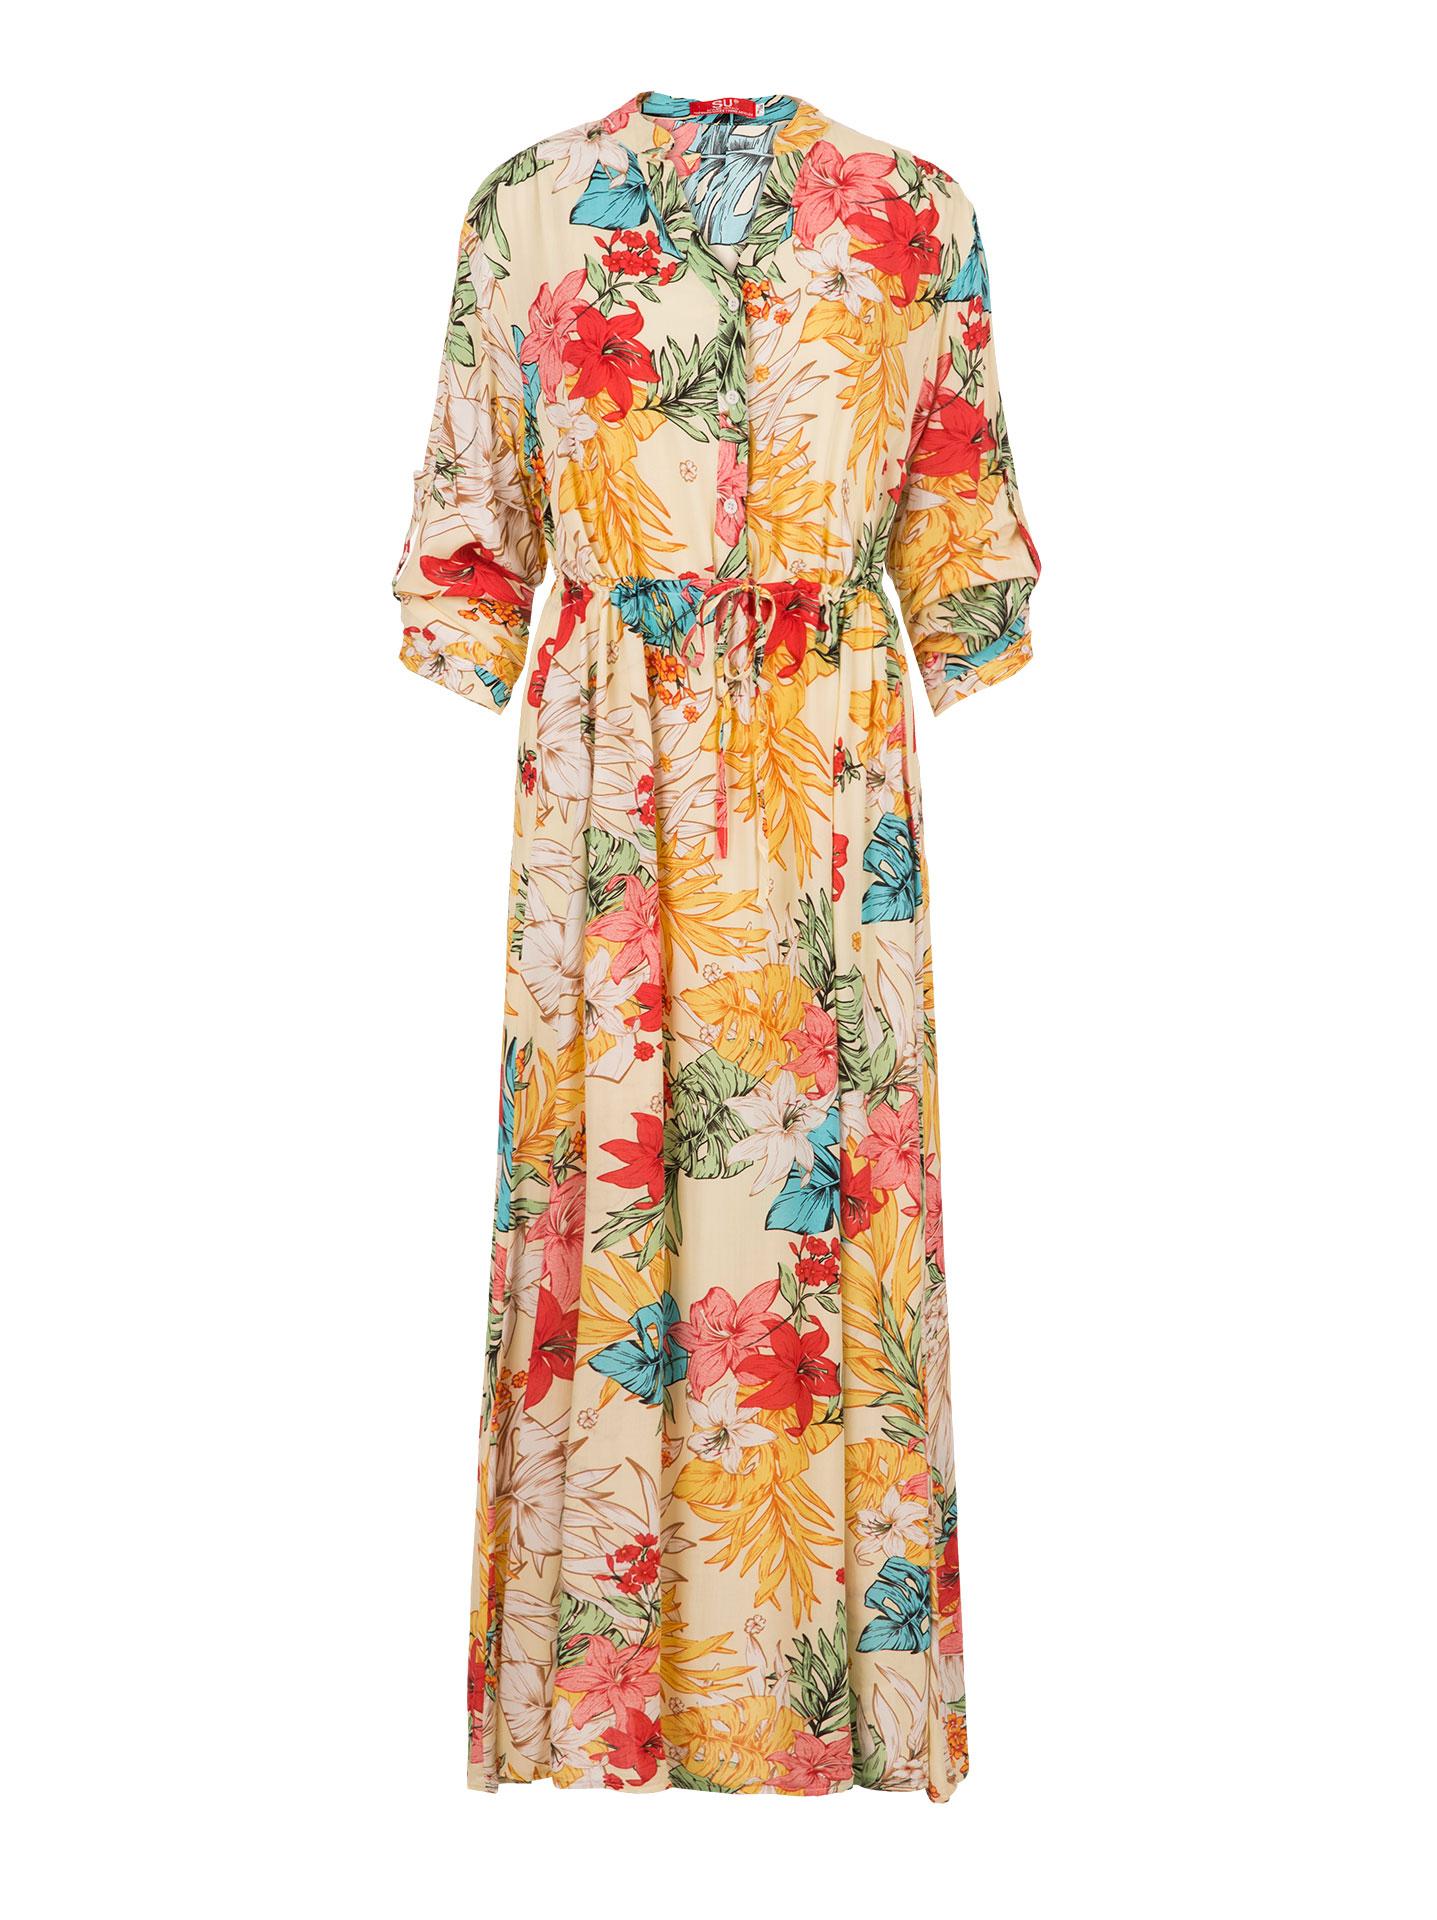 d499de90cd1 Φόρεμα με εσωτερικό κορδόνι σε κιτρινο ανοιχτο, 17,95€   Celestino